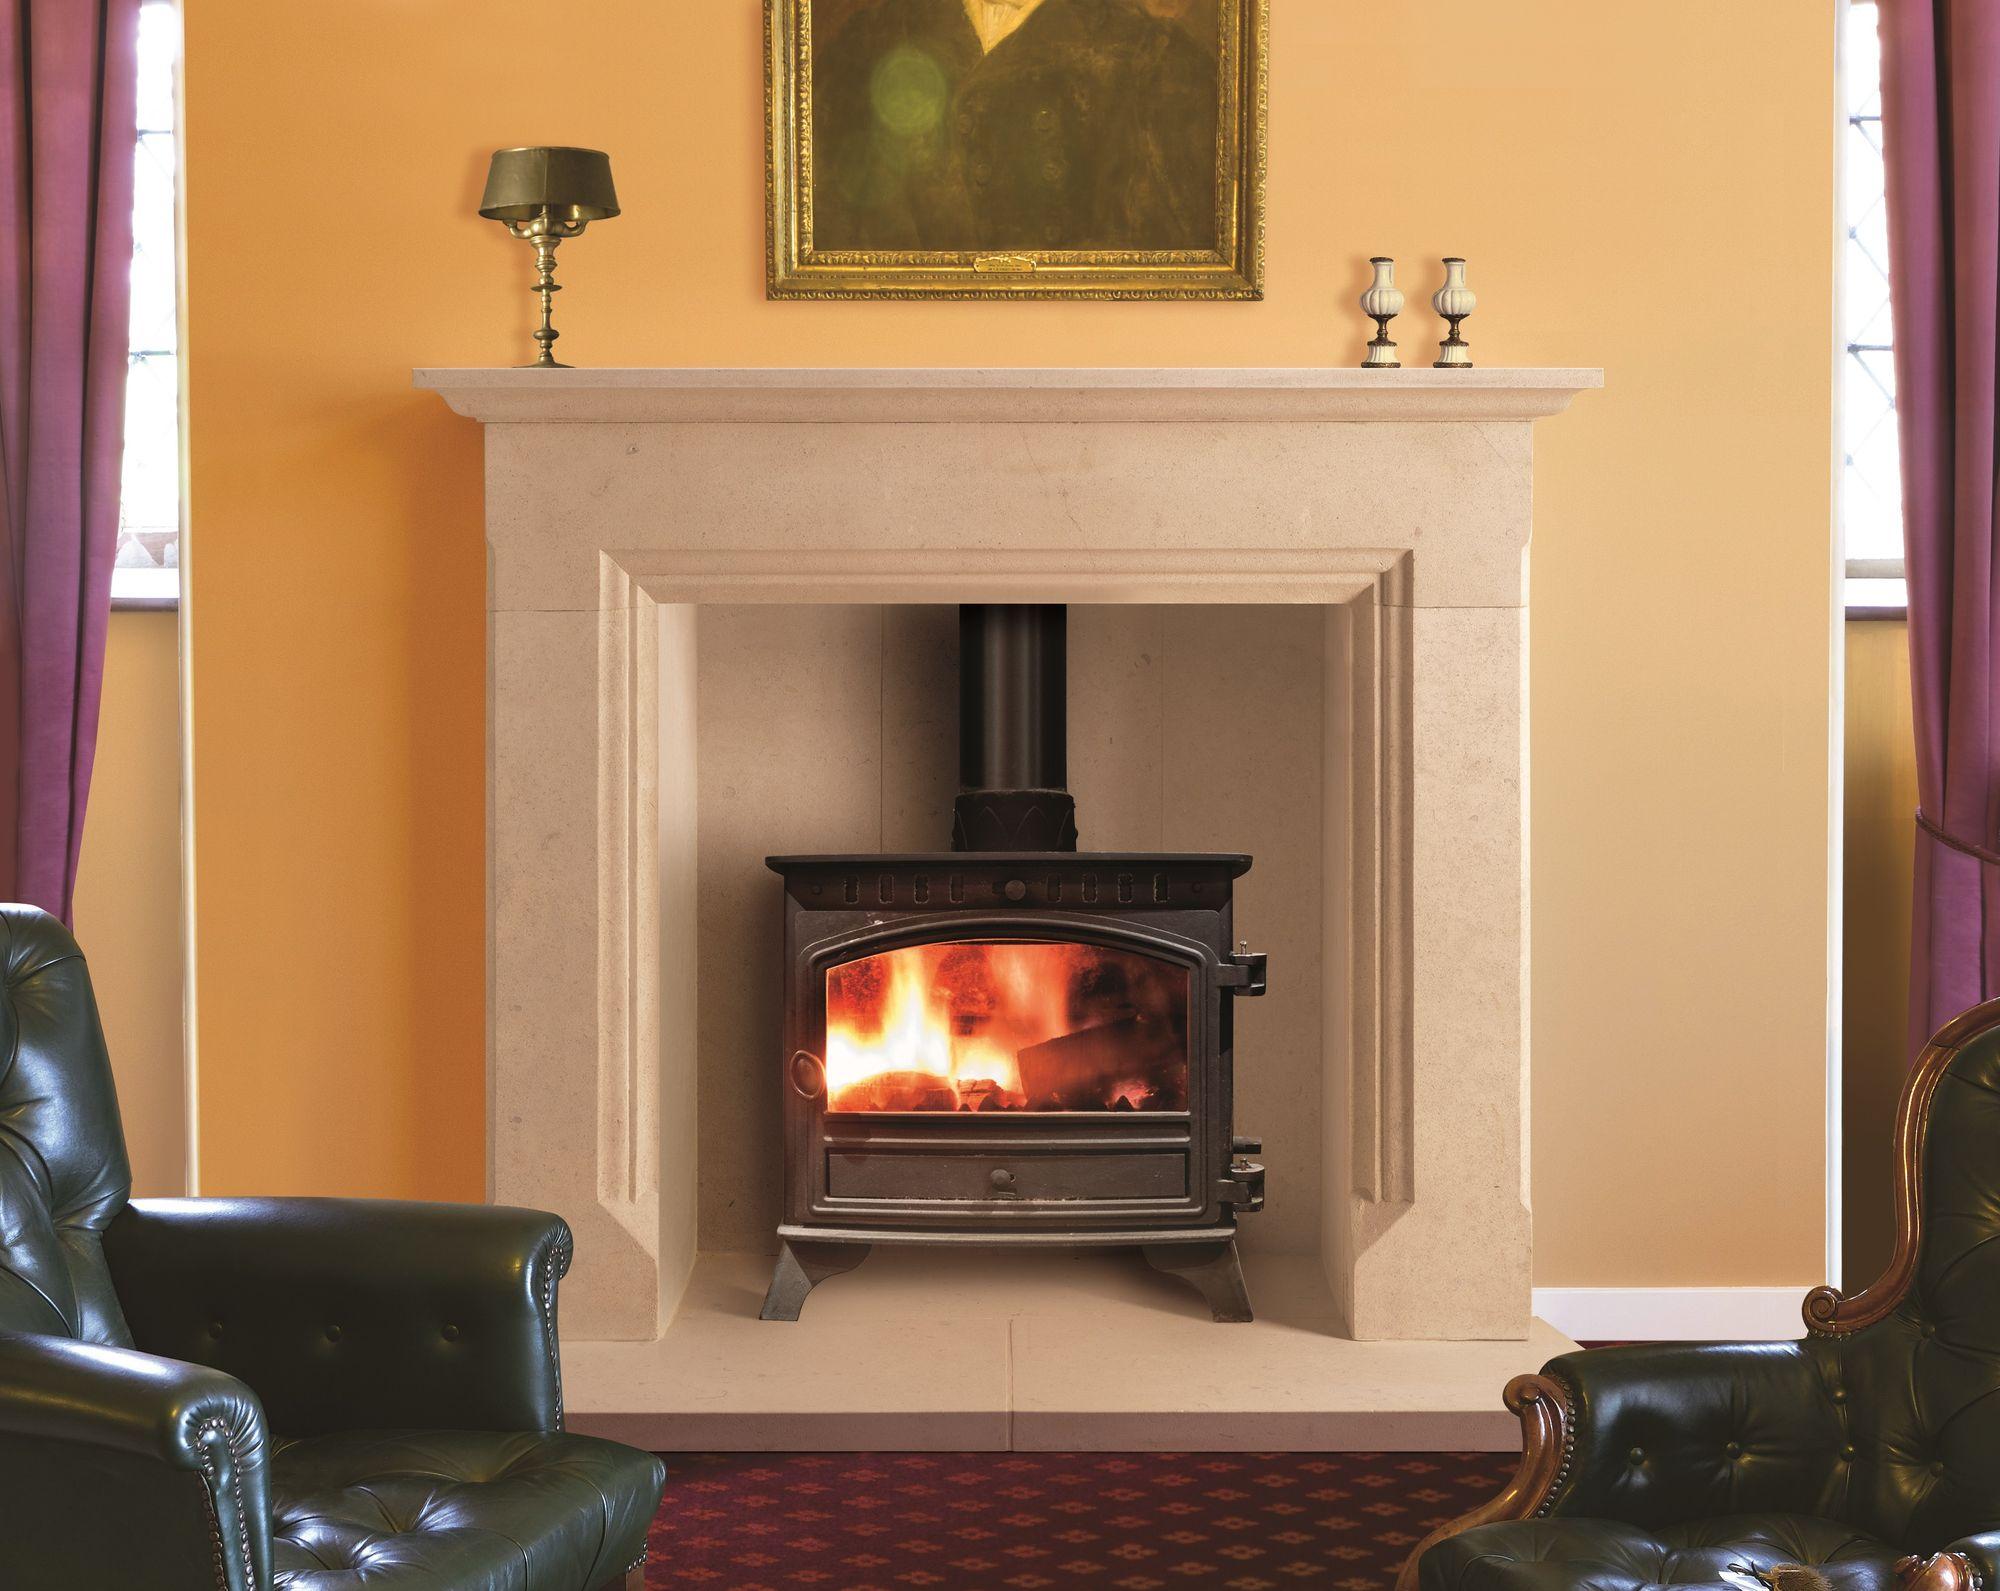 The Belton Bathstone Fireplace